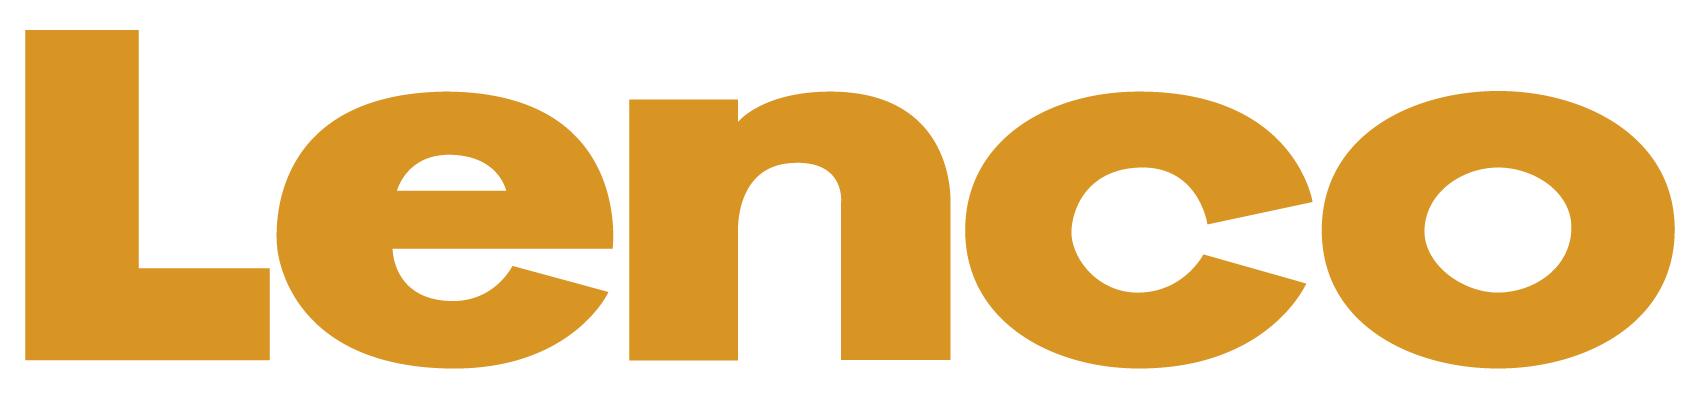 lenco.png